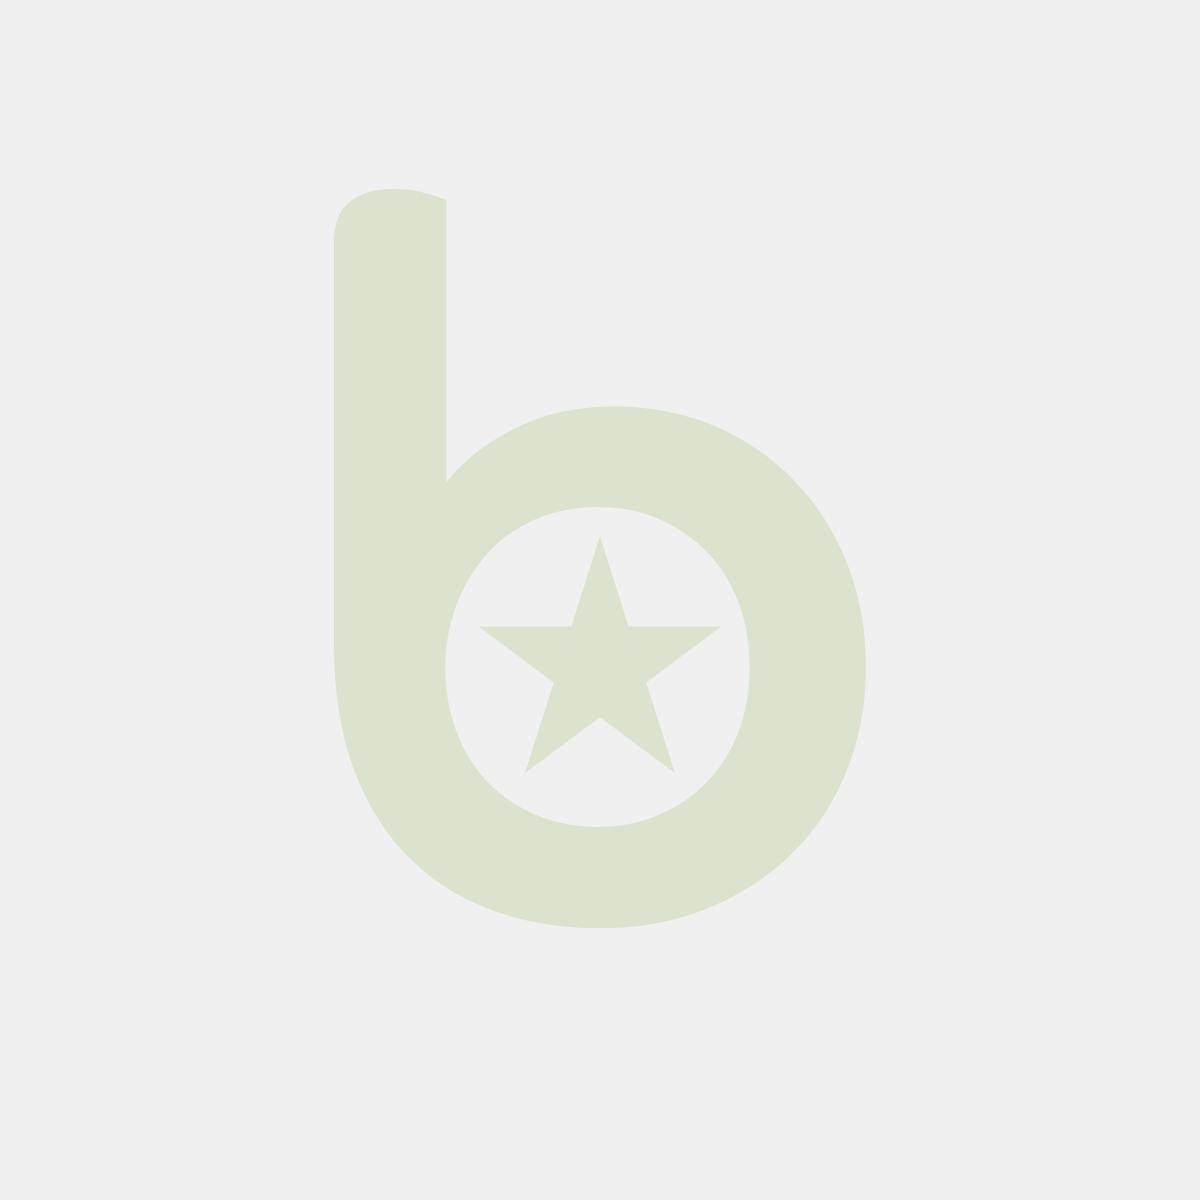 Serwetki PAPSTAR Royal Collection Casali 40x40 bordowe opakowanie 50szt